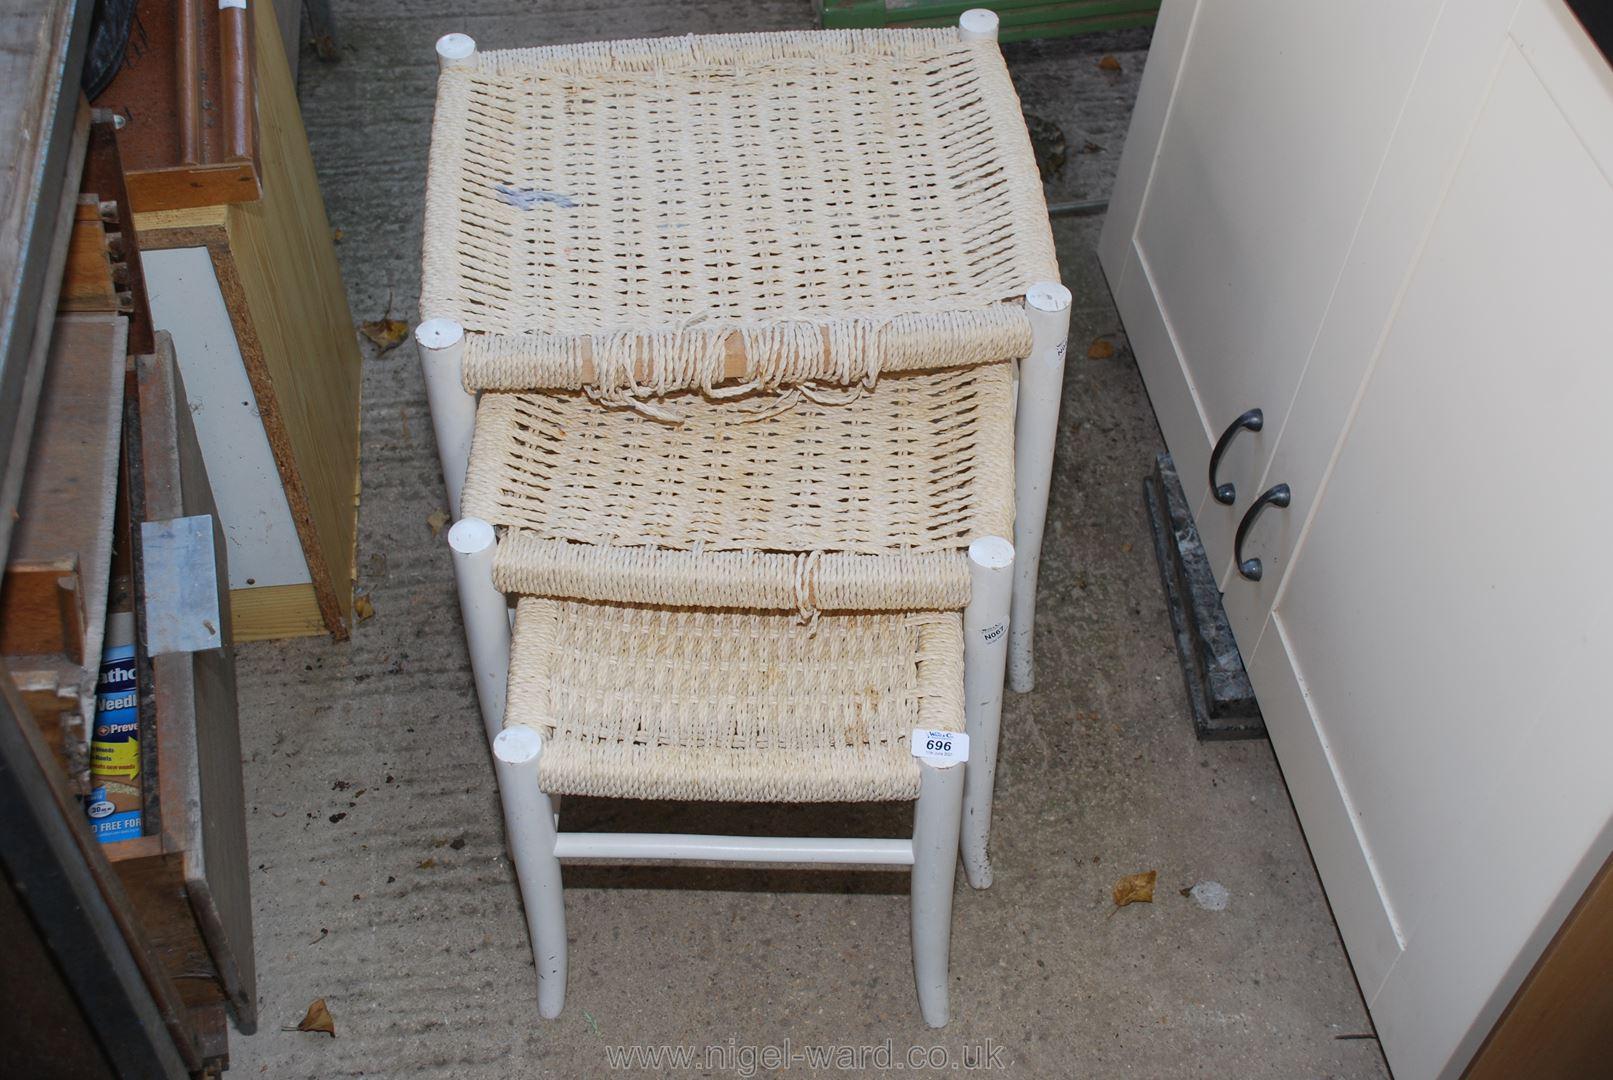 A nest of three stringwork stools a/f.